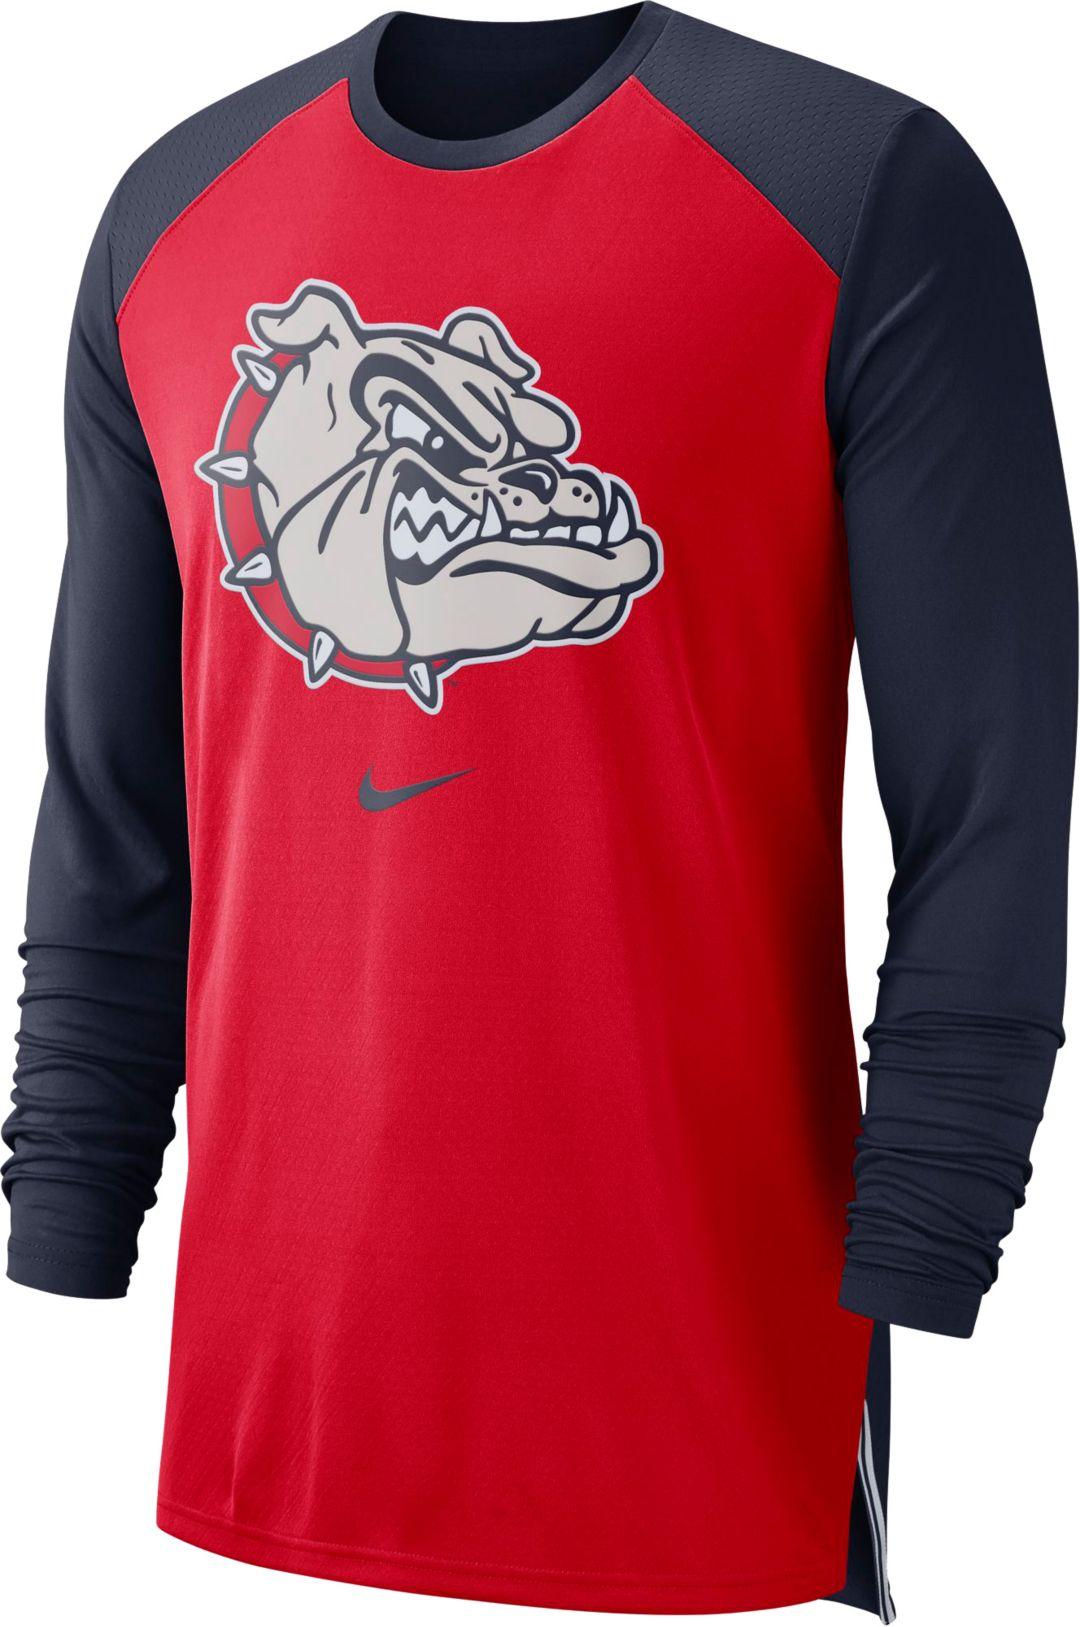 dcddda3f Nike Men's Gonzaga Bulldogs Red/Blue Long Sleeve Shooting Shirt.  noImageFound. Previous